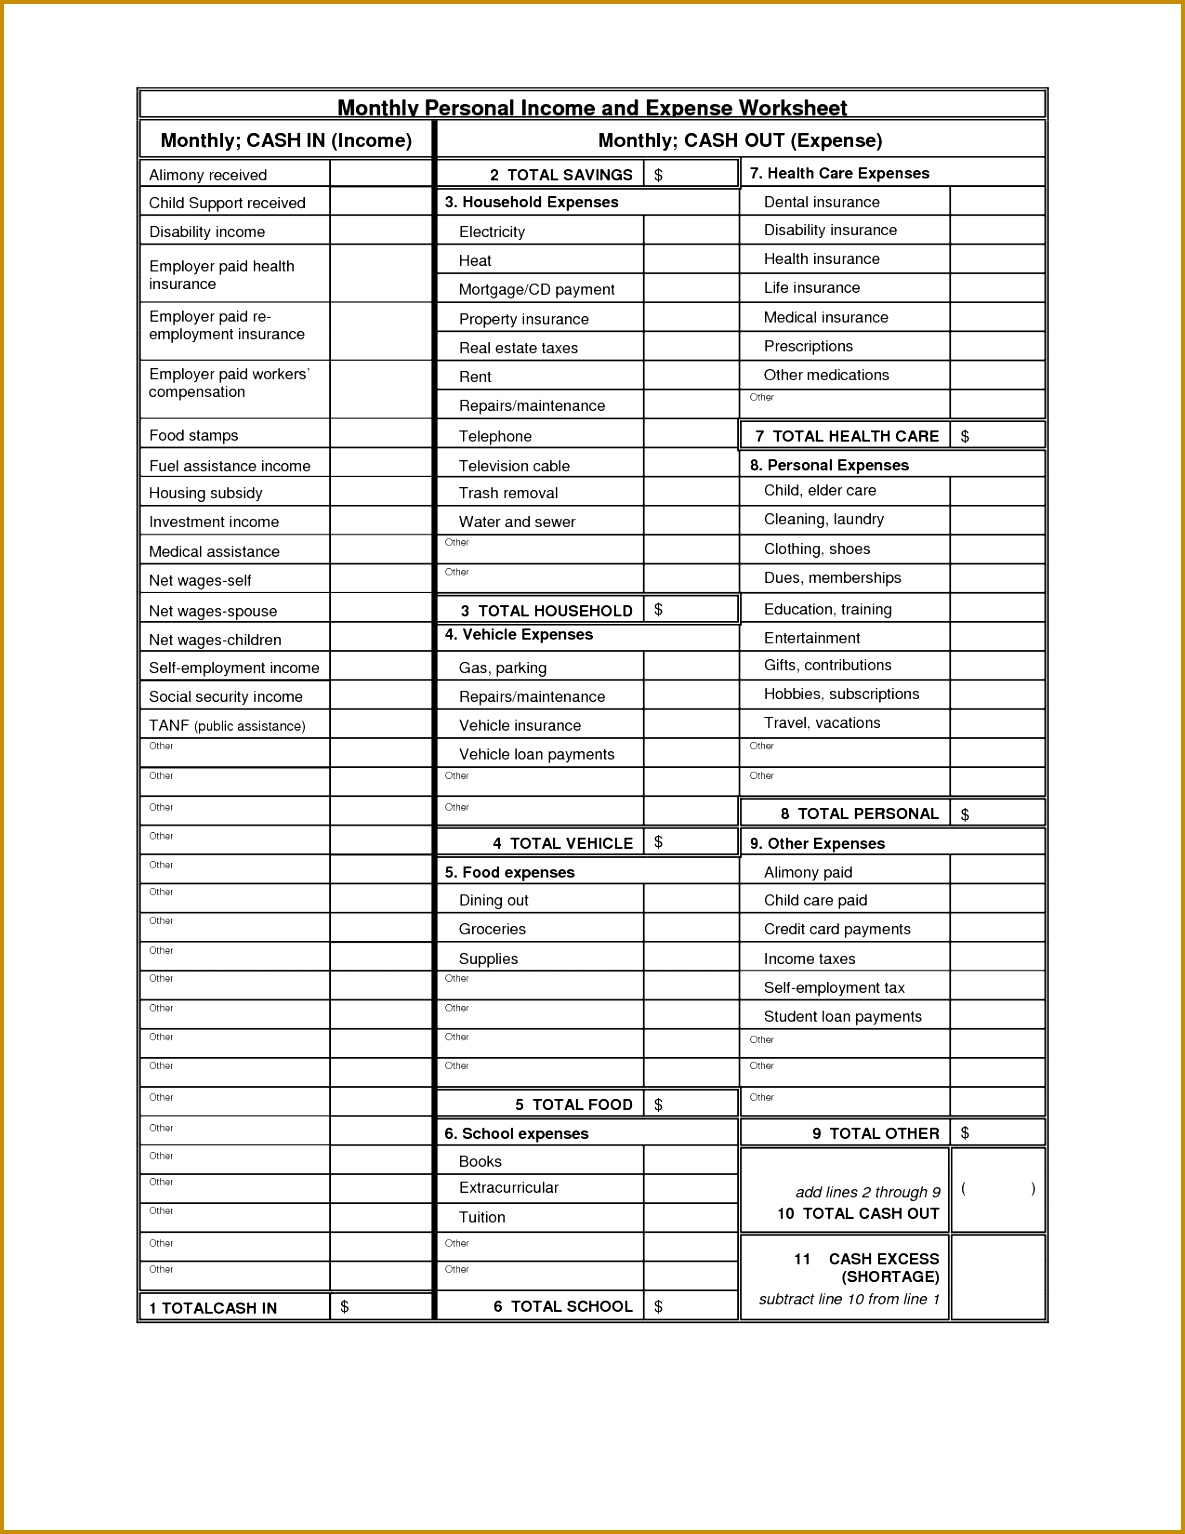 Personal Financial Balance Sheet Template 15341185